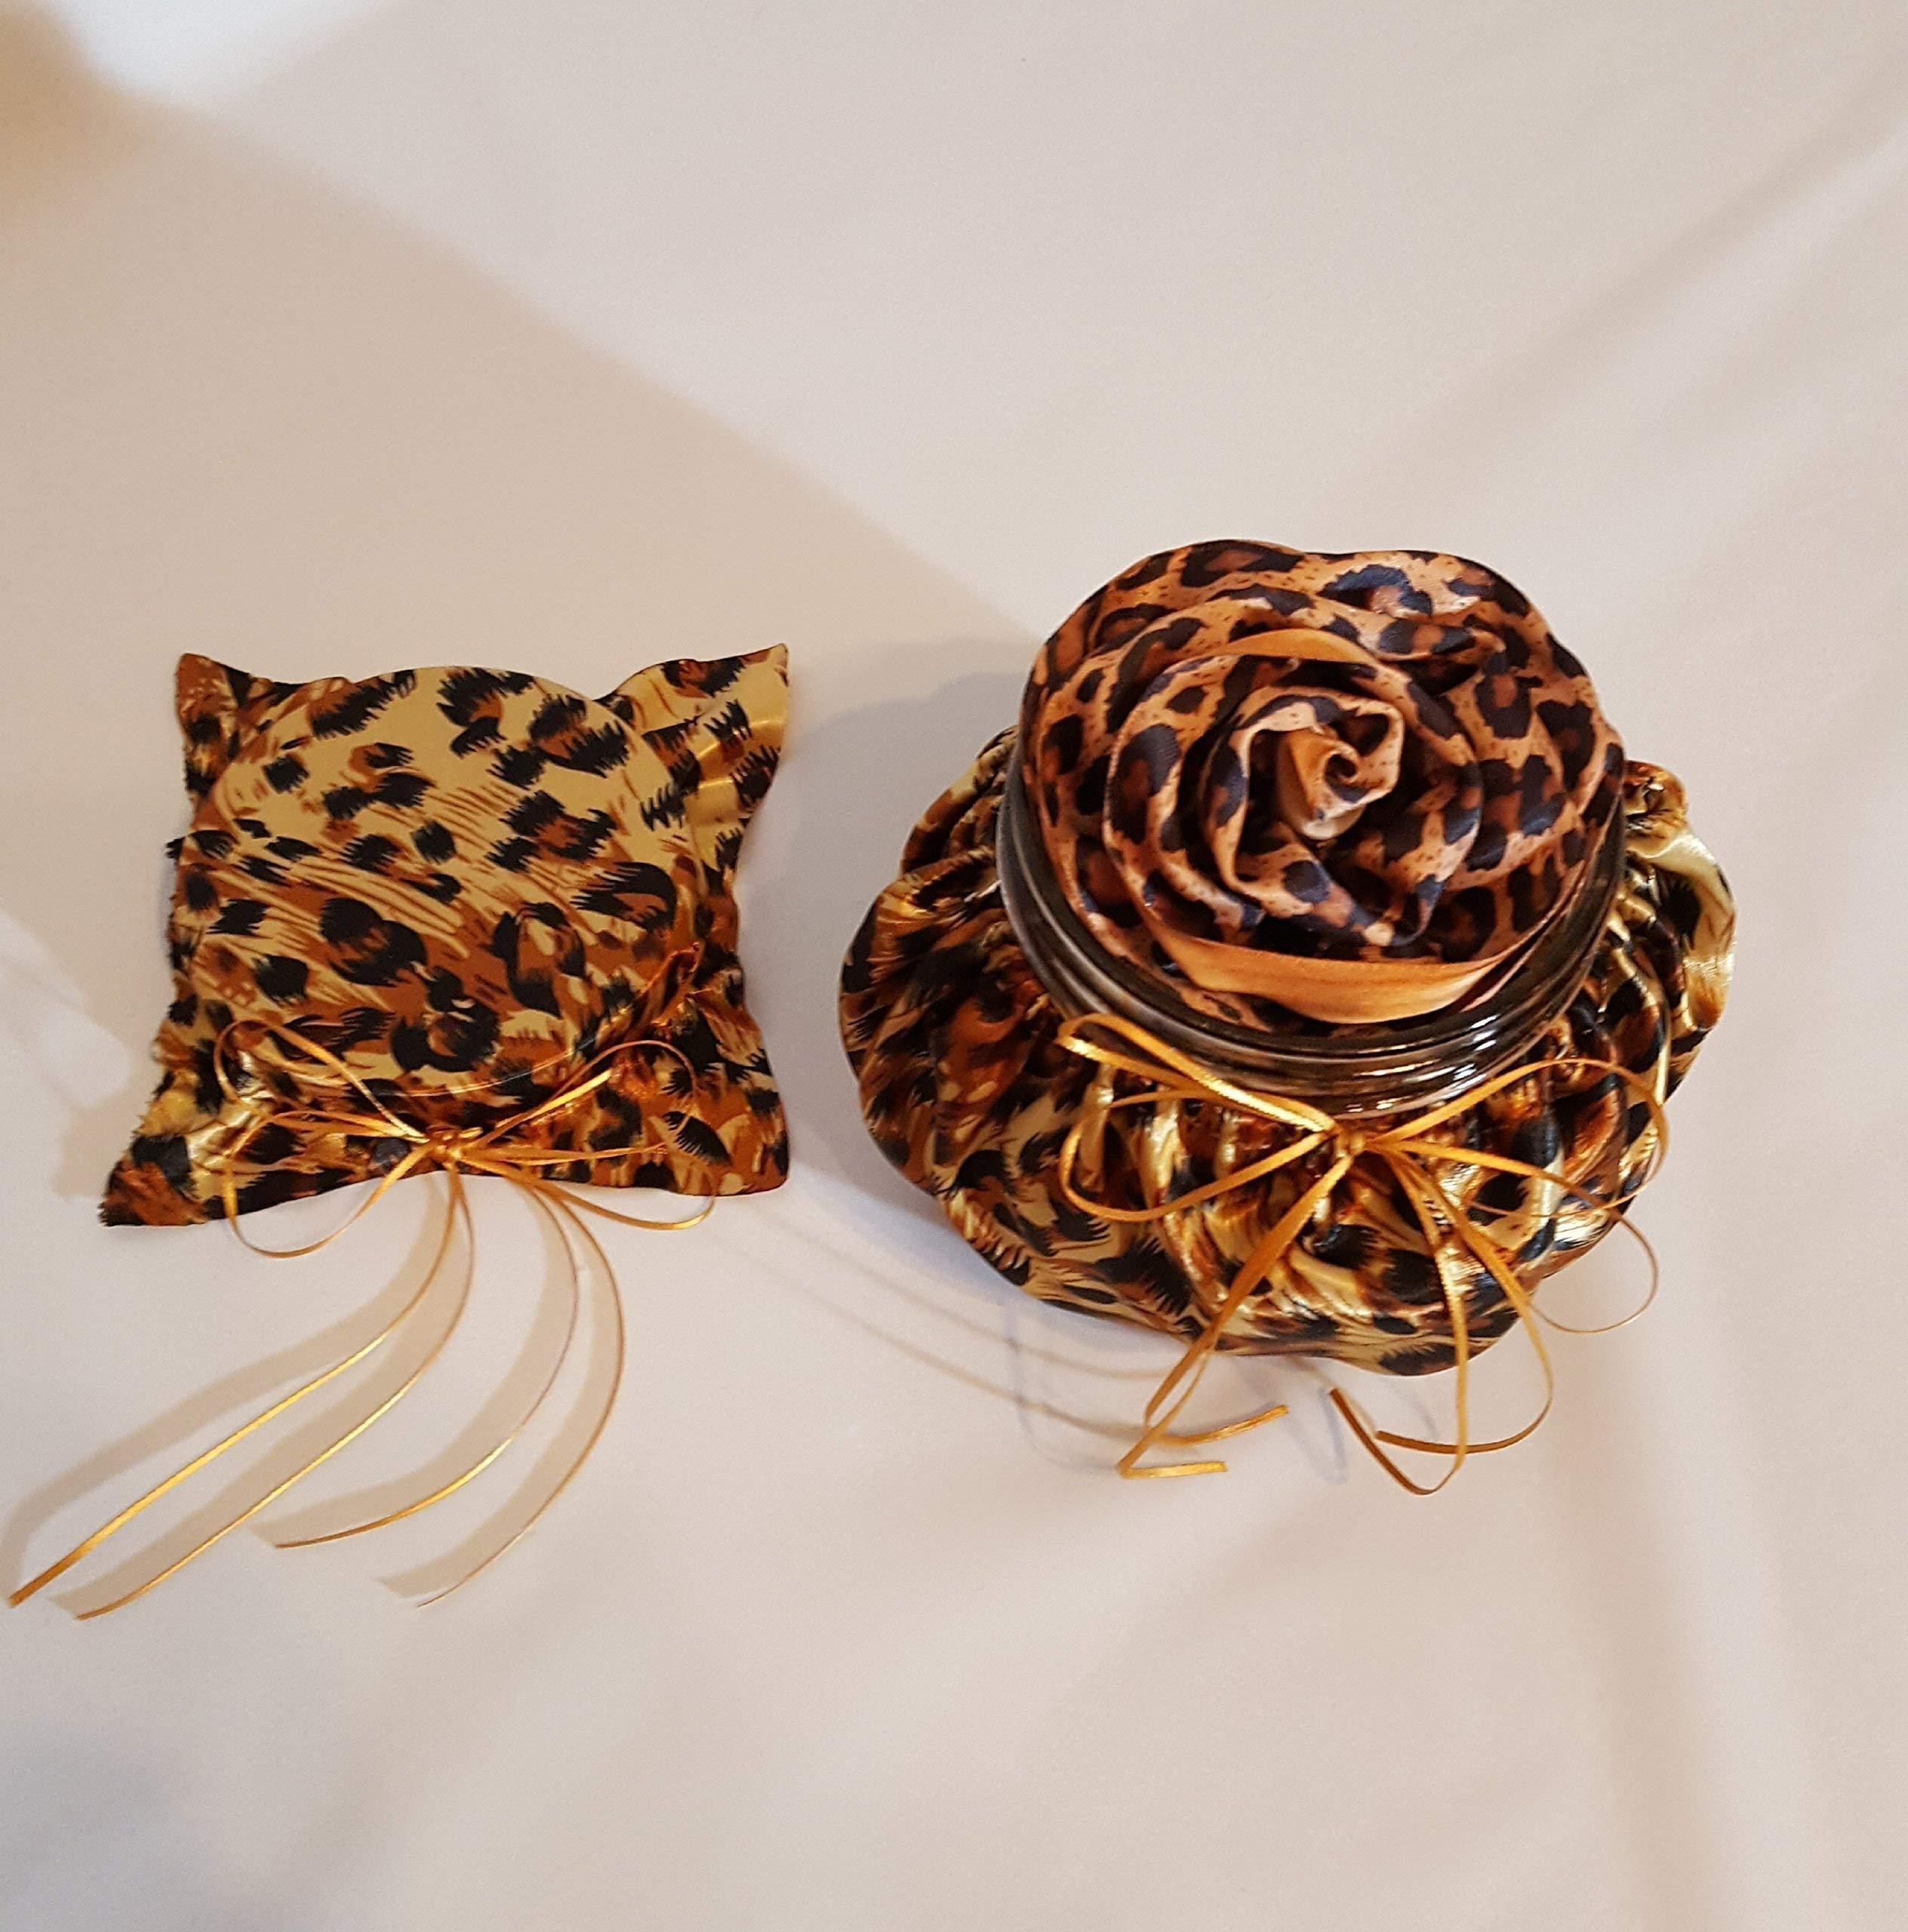 Handmade Scented Cheetah Animal Print Satin Ribbon Rose Head Room Air Freshener in a Cheetah Animal Print Fabric Covered Decorative Jar and Lid